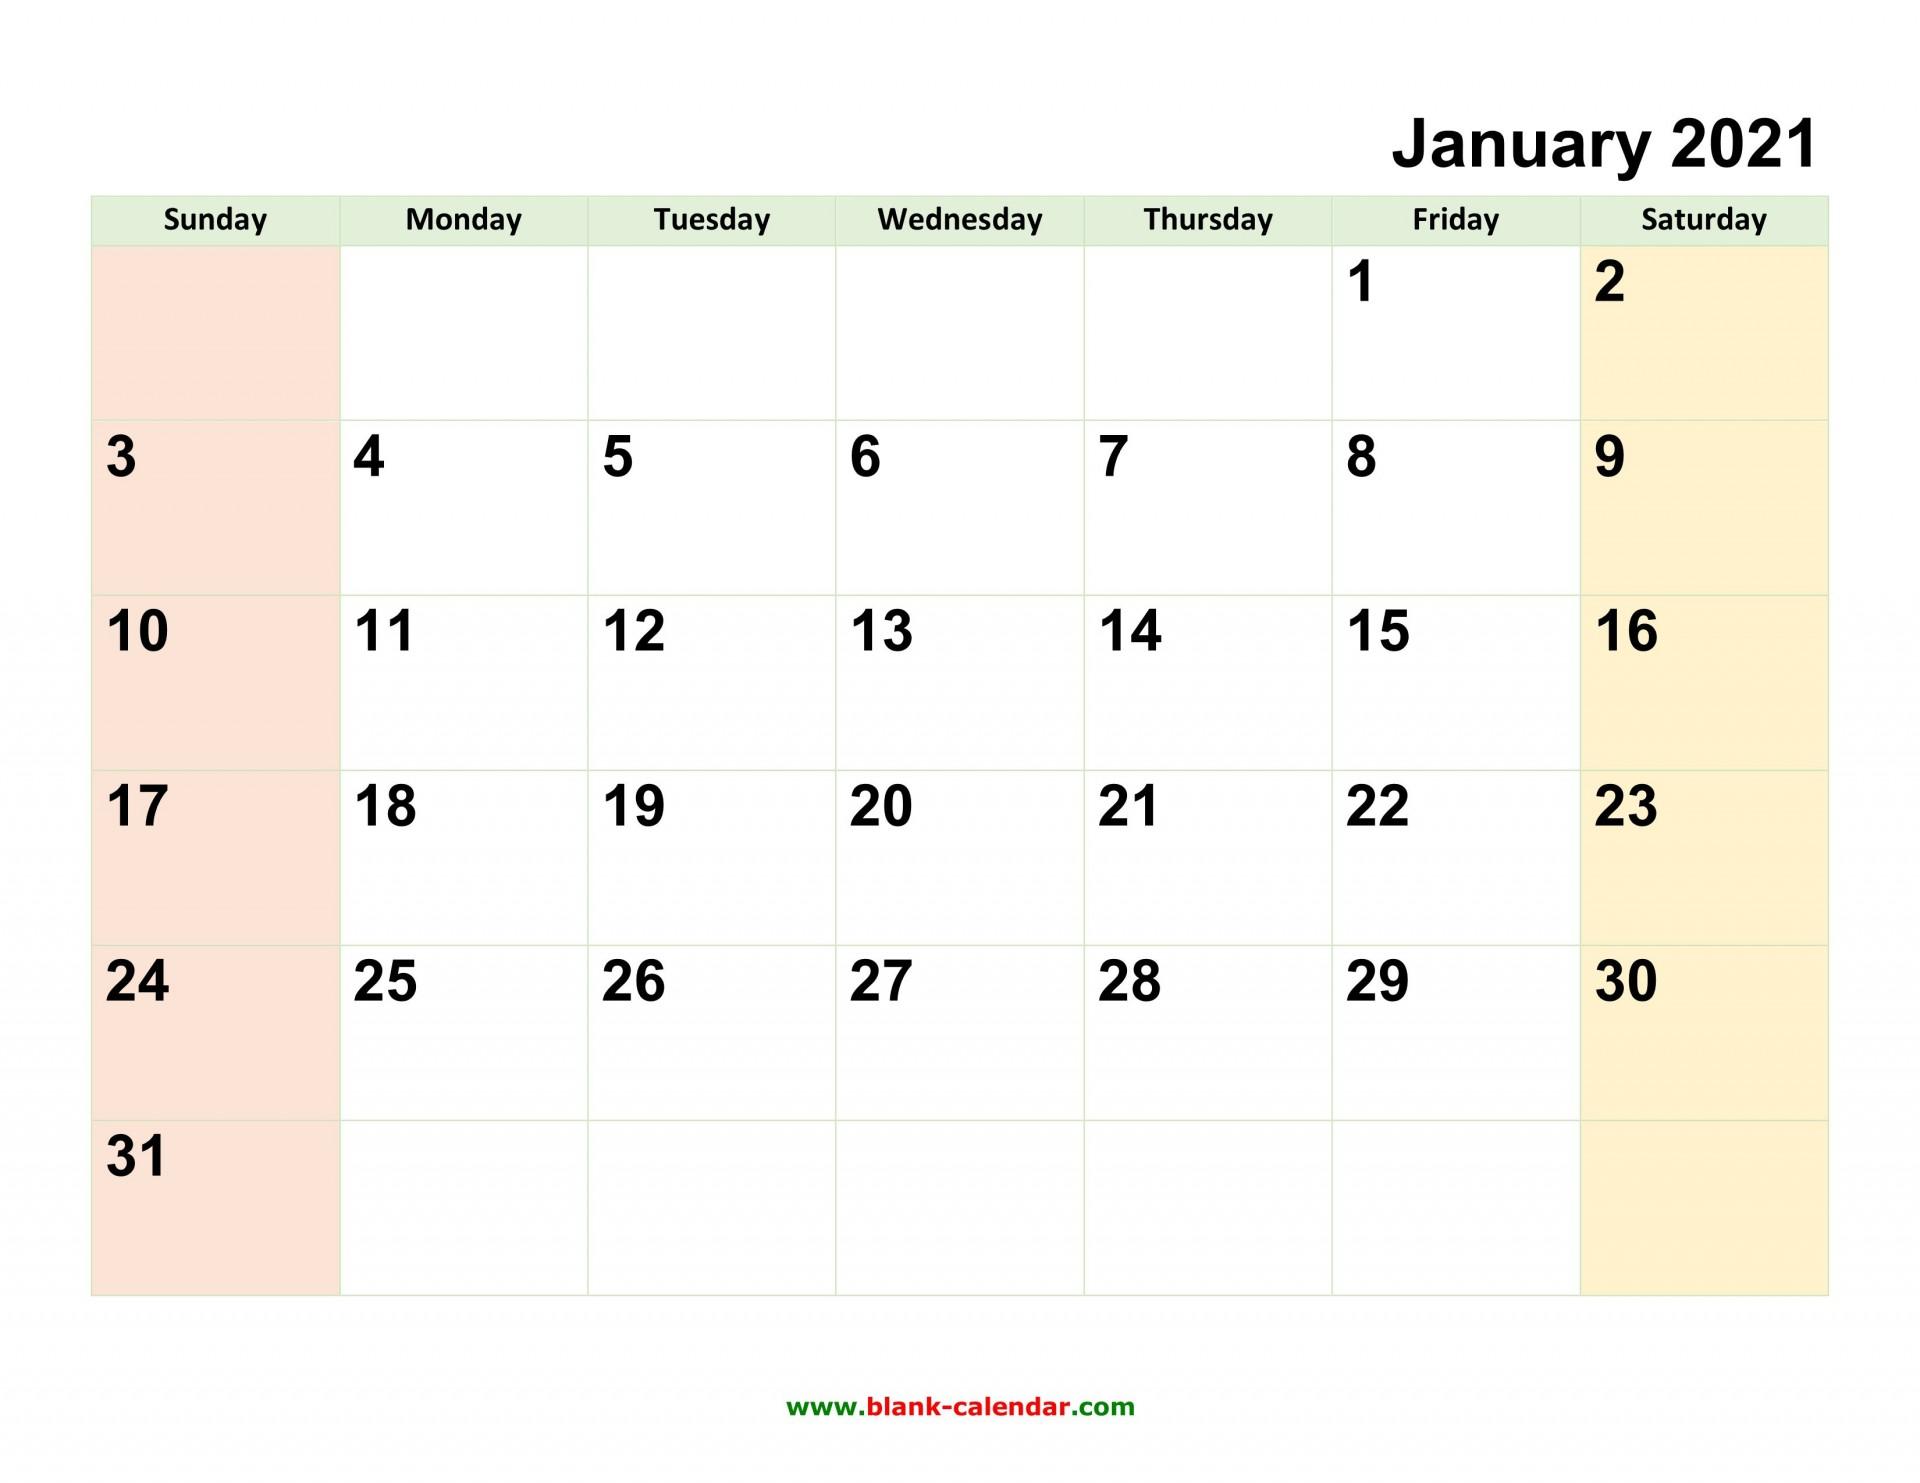 003 Formidable Google Doc Weekly Calendar Template 2021 Photo  Free1920